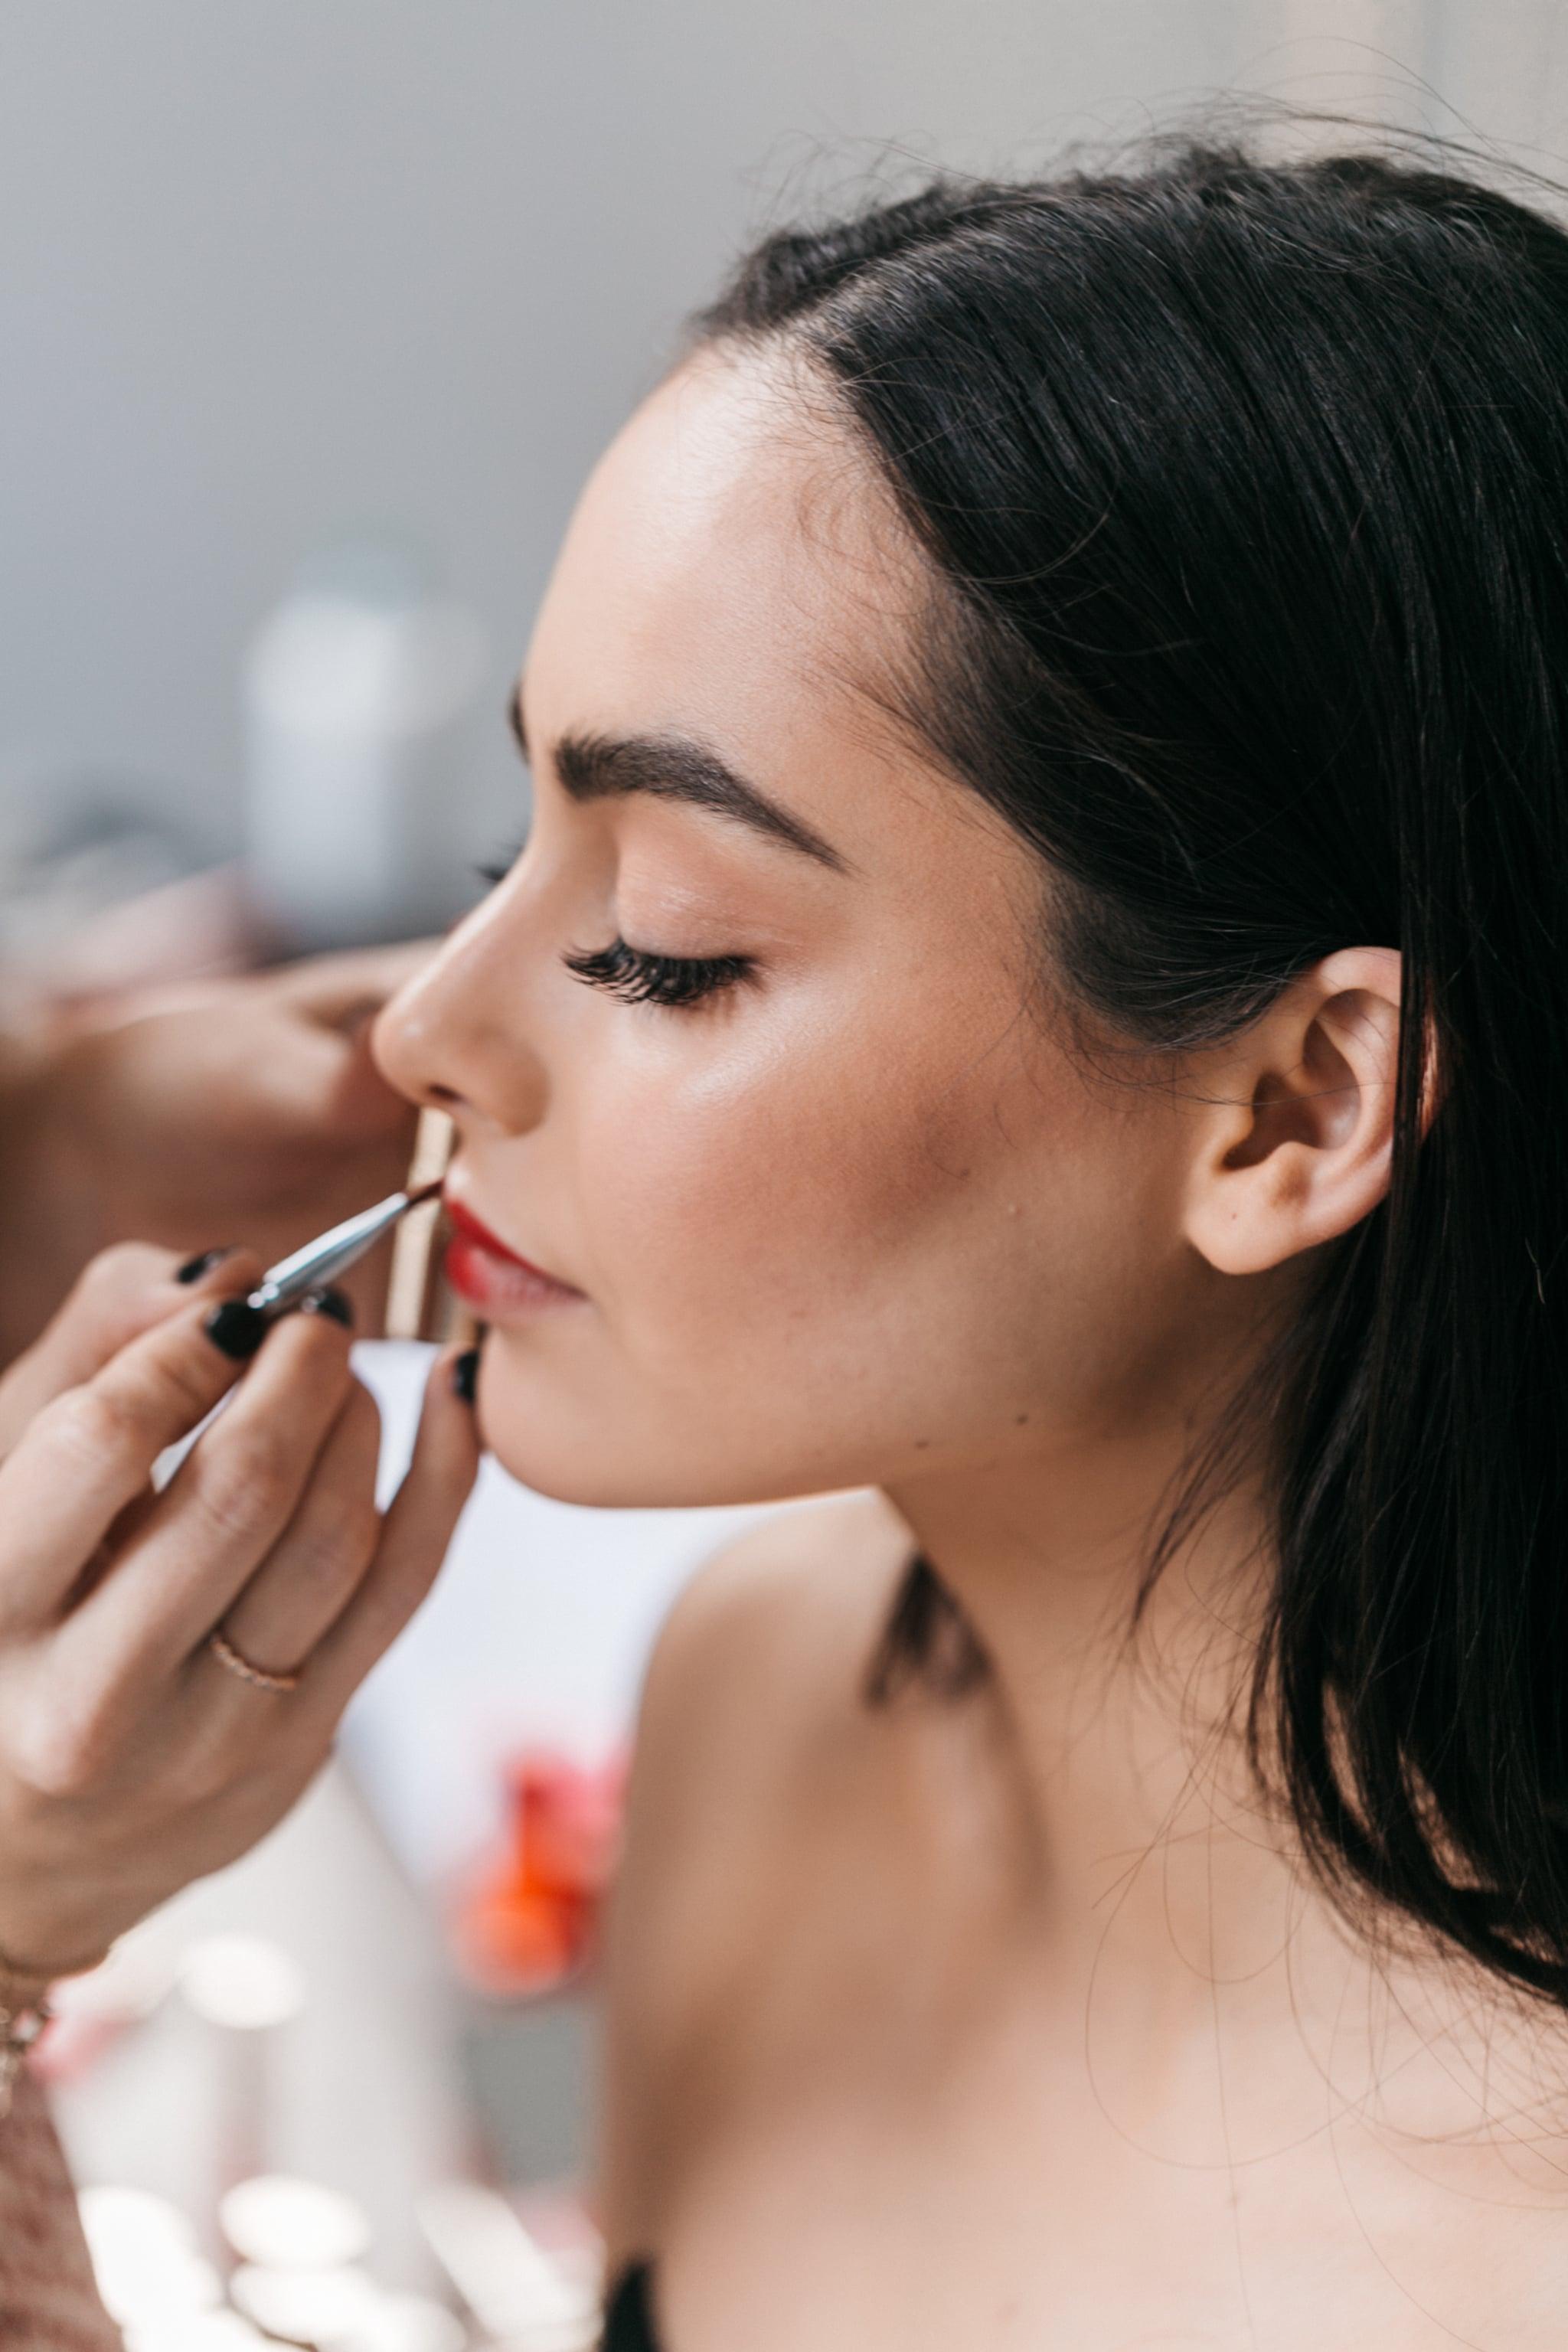 Makeup Artist Tips For Applying Red Lipstick